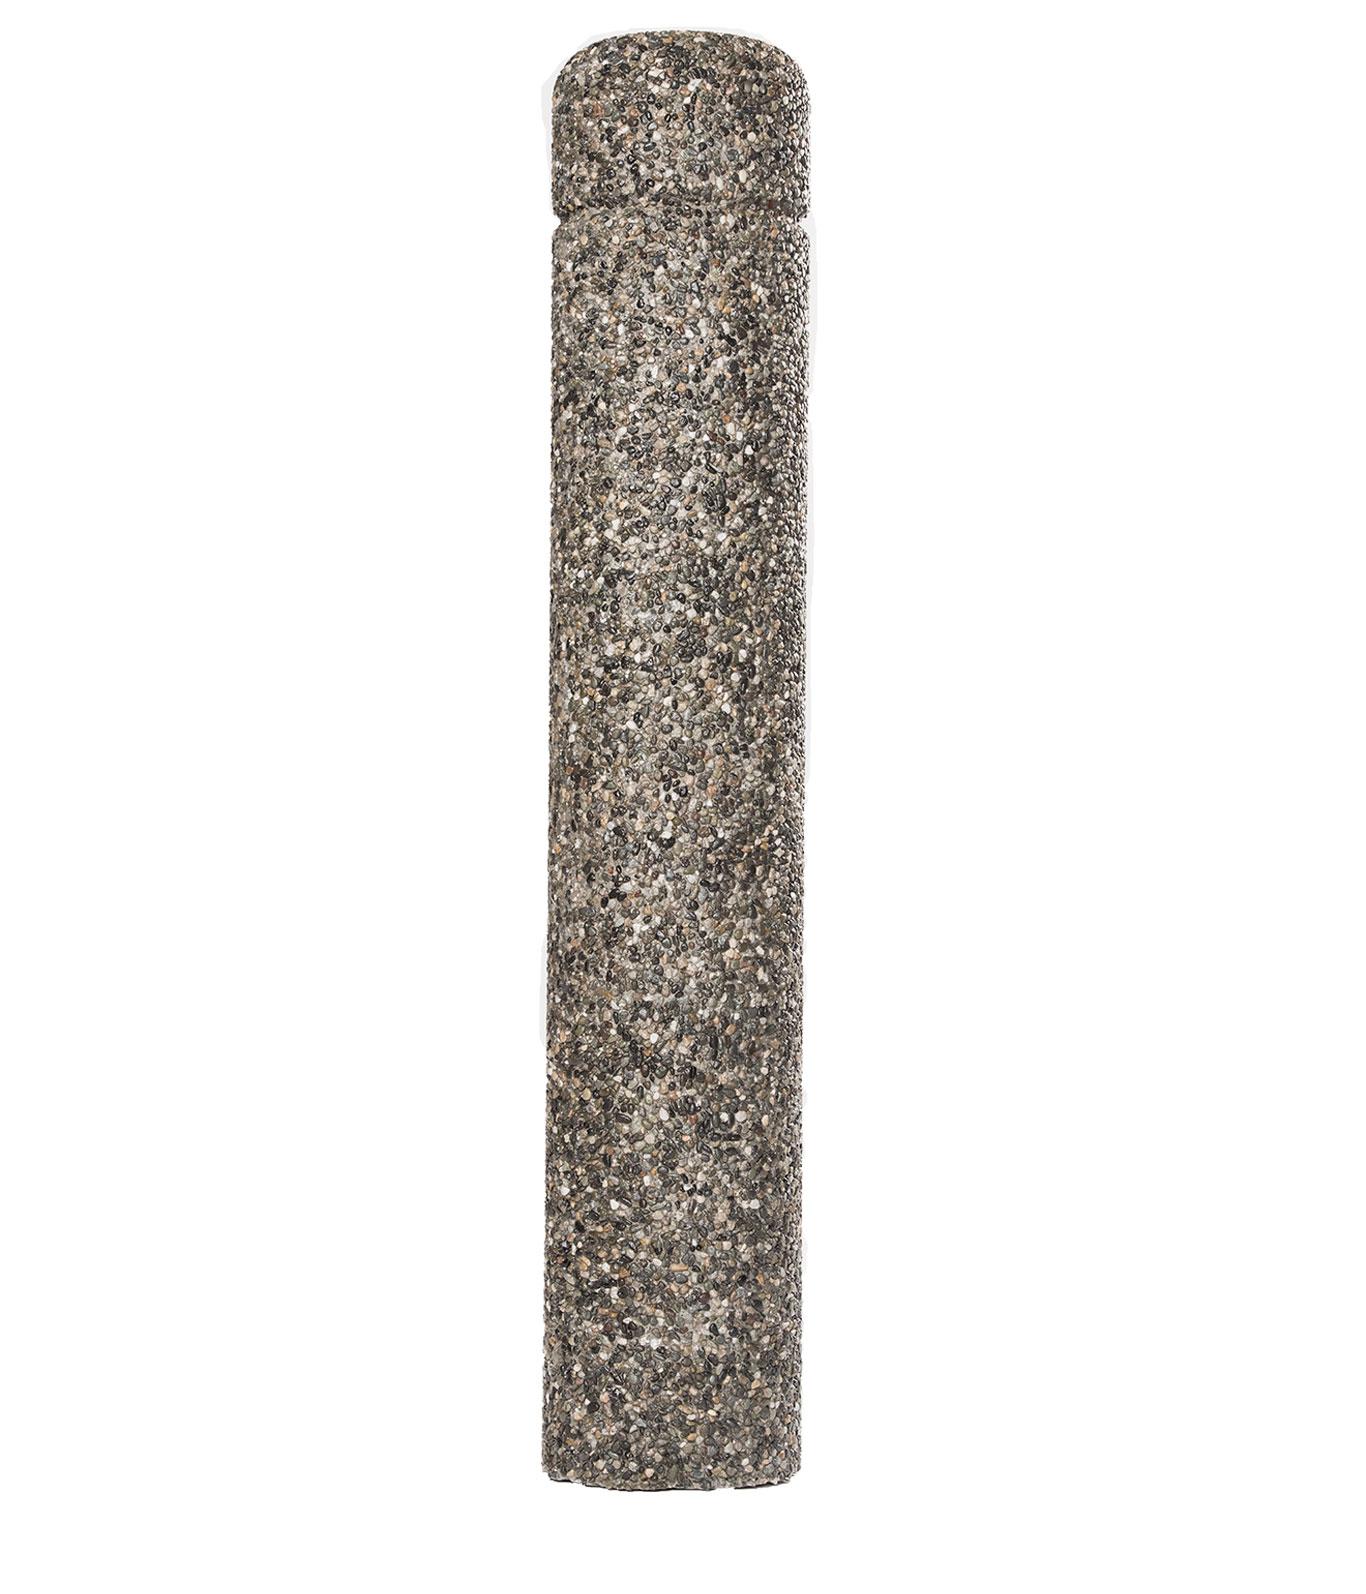 R-9704 concrete bollard